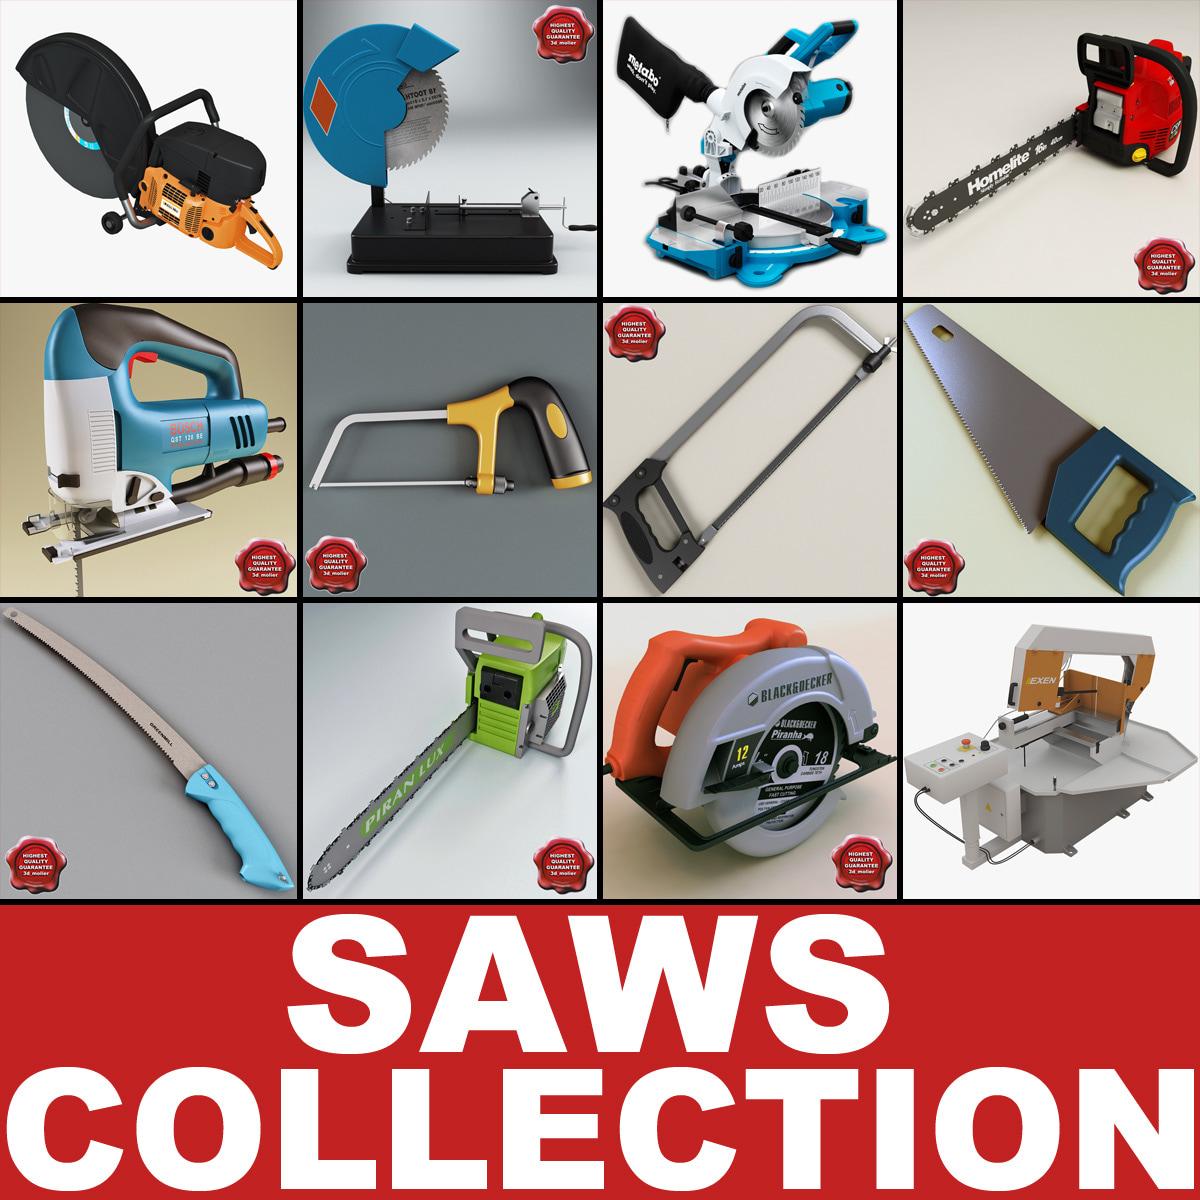 Saws_Collection_V5_000.jpg